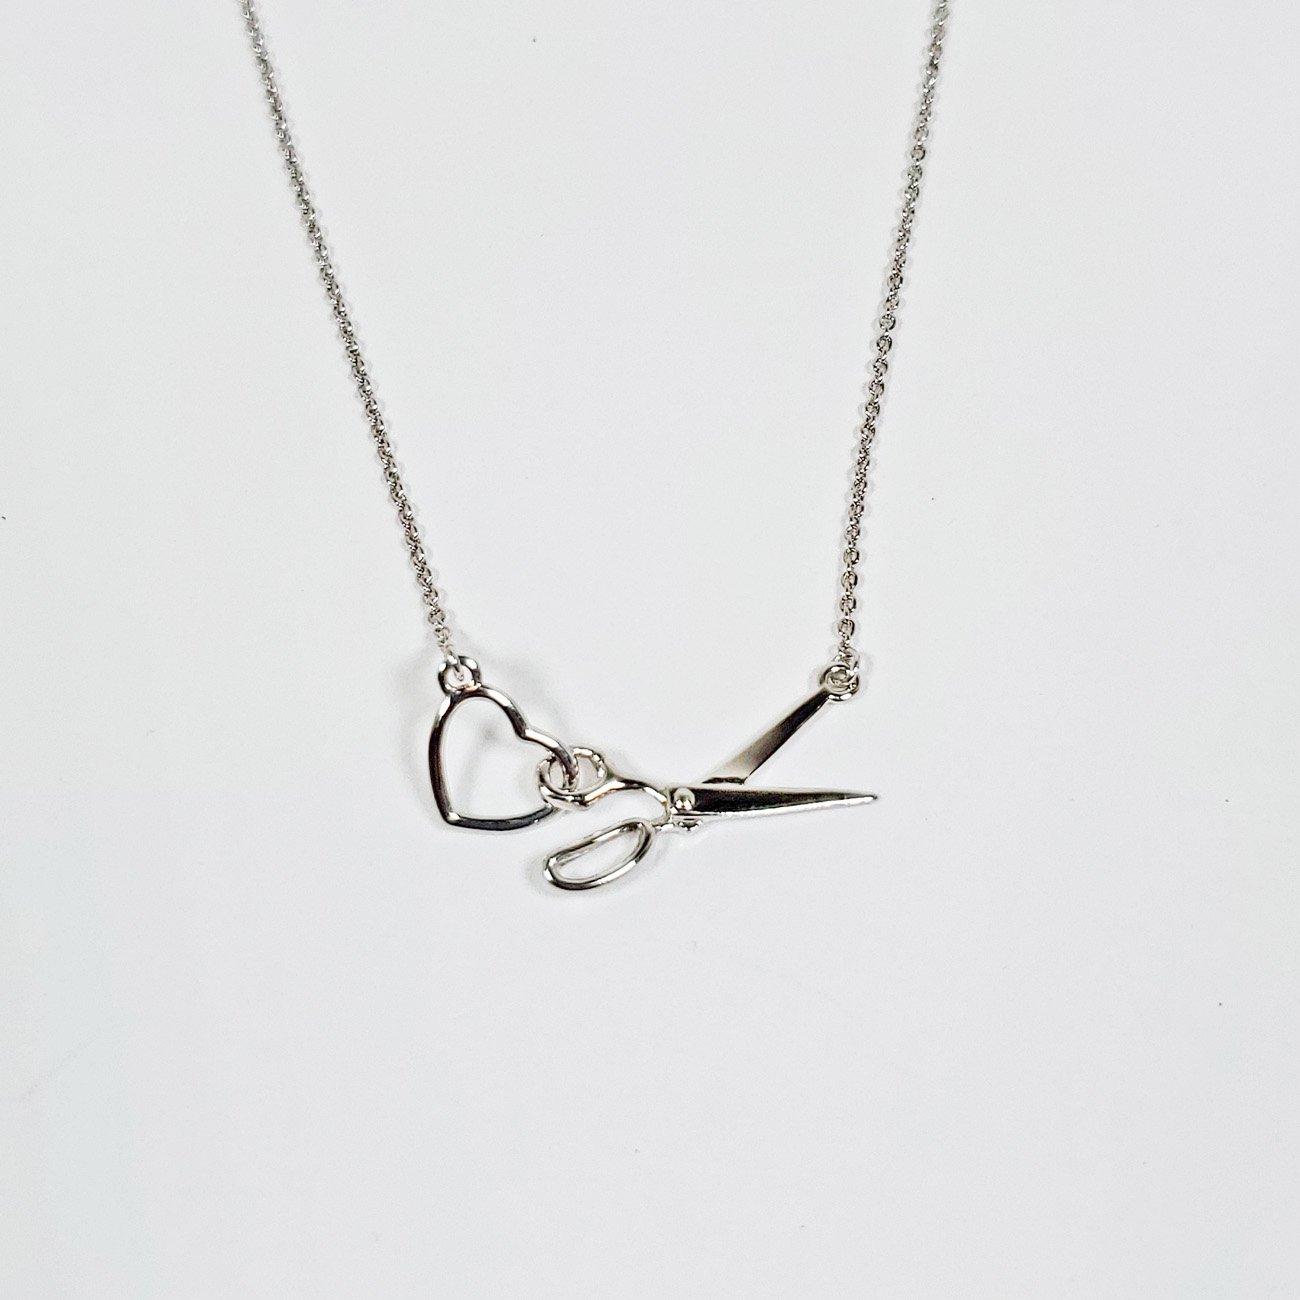 Scissor Heart Charm Necklace Silver